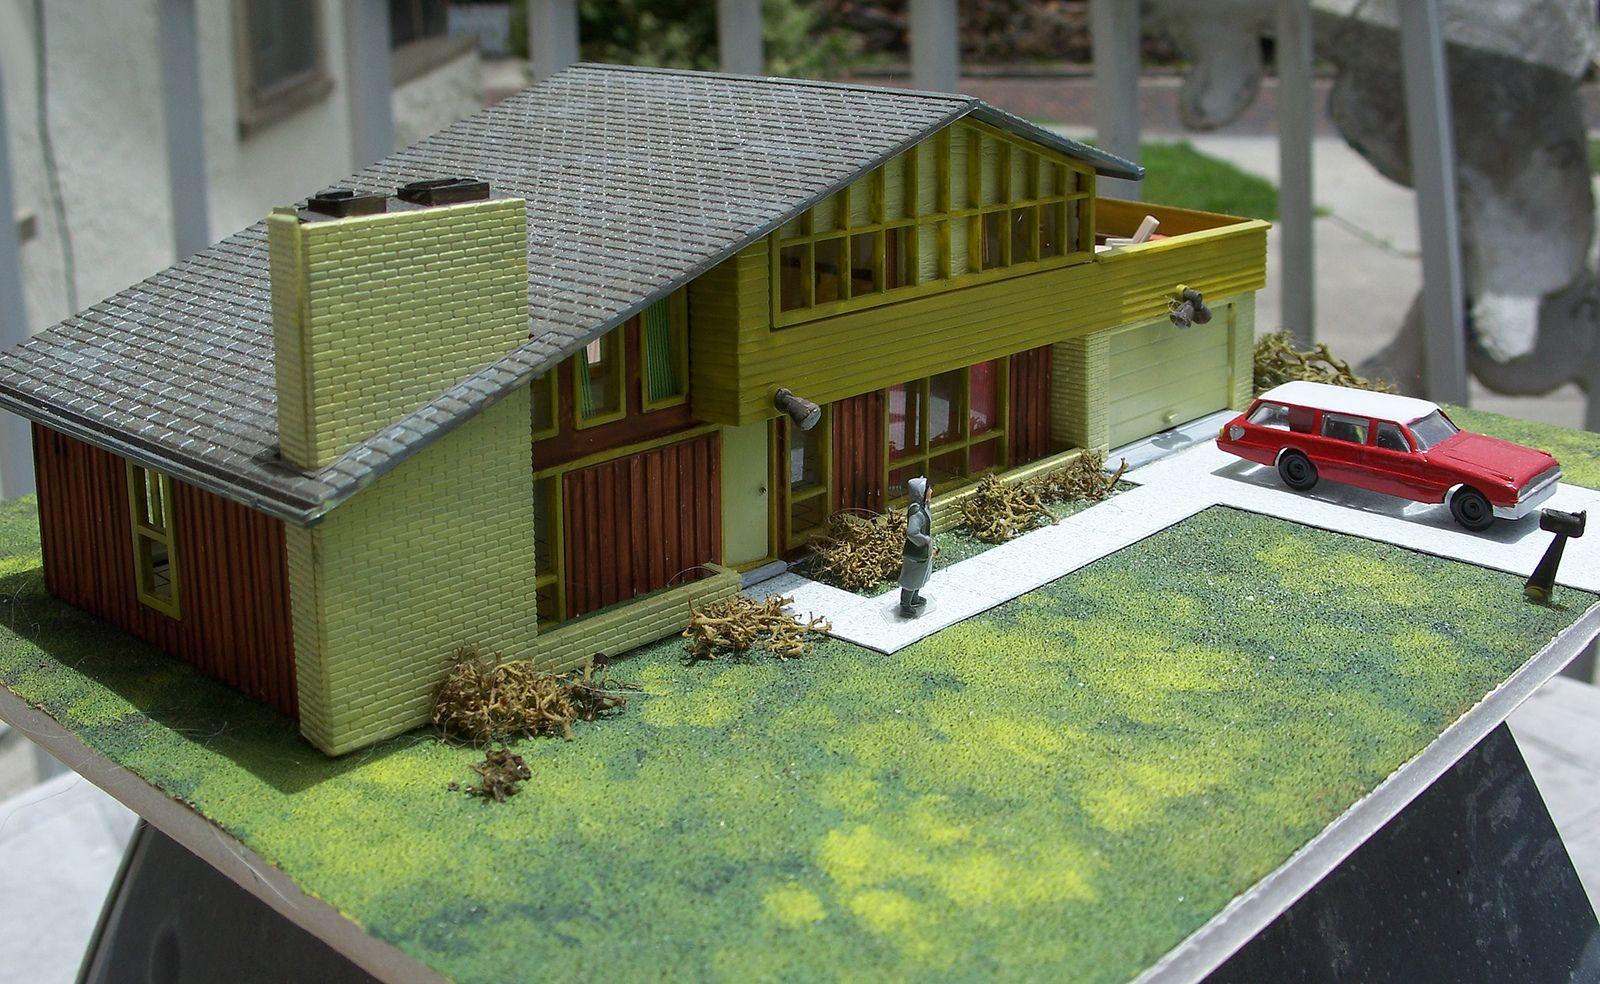 Small Model Houses Model House Kits Model Homes House Styles